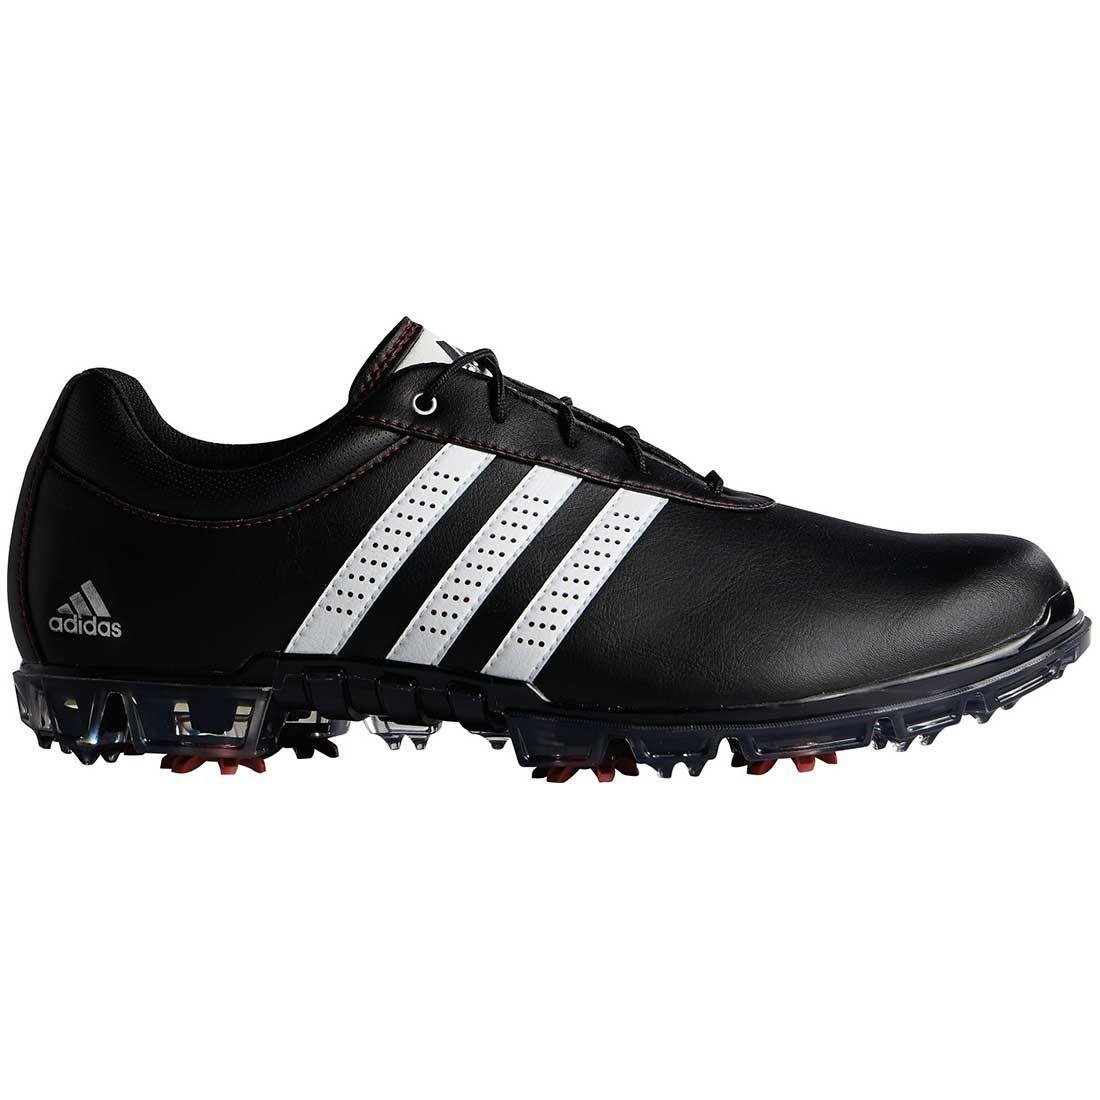 Buy Adidas AdiPure Flex Golf Shoes Black/White/Red | Golf Discount